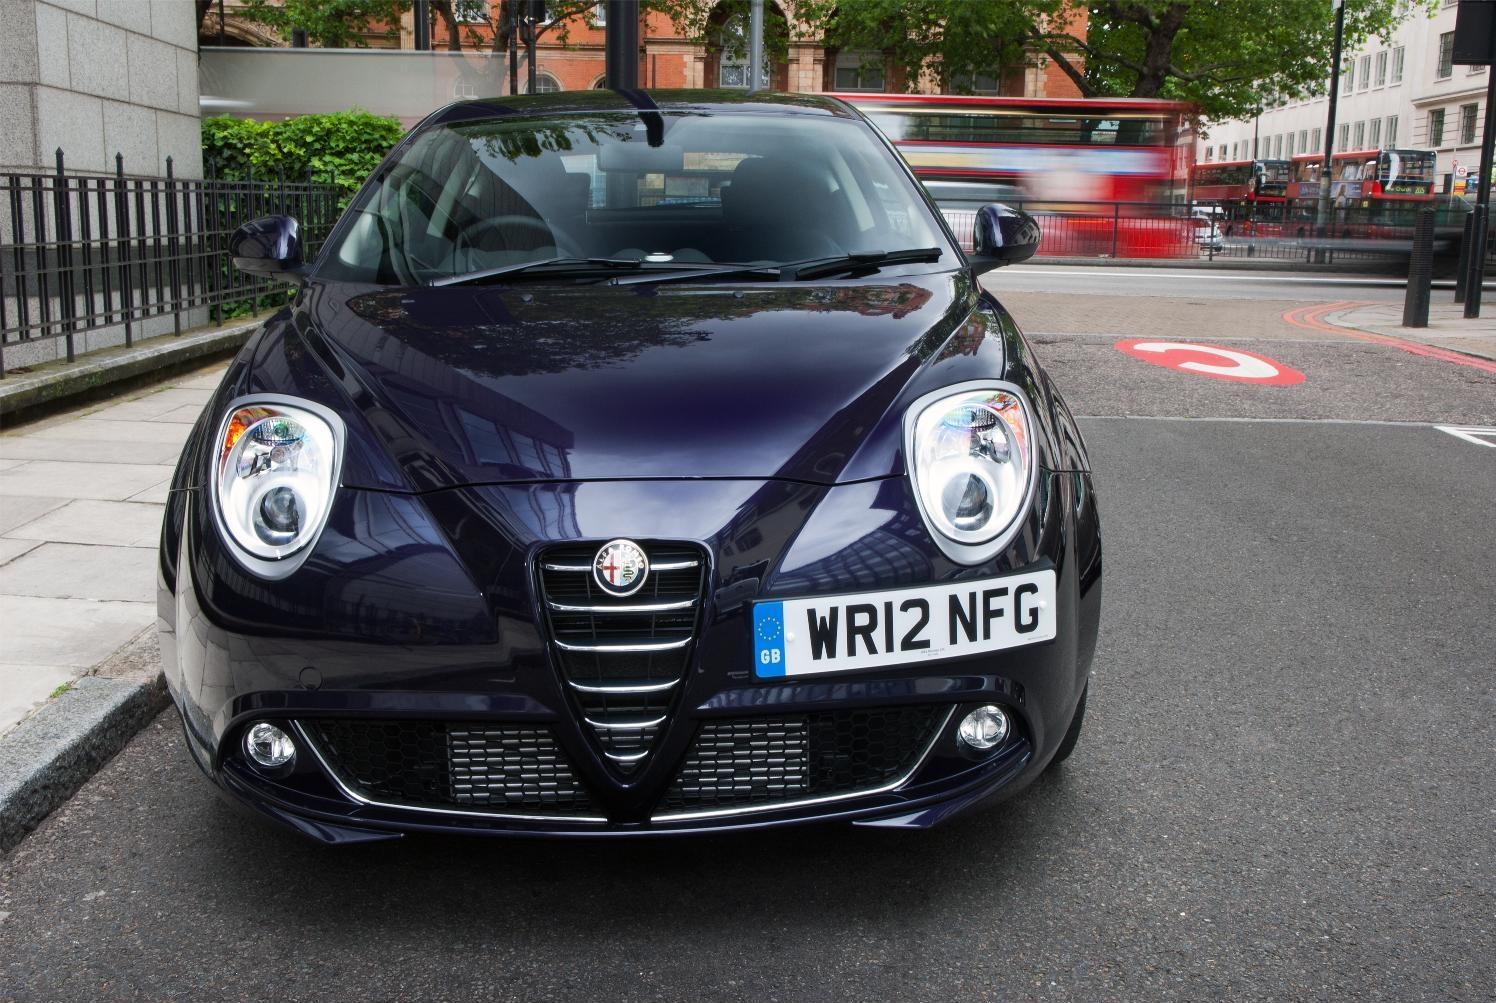 Alfa Romeo Mito TwinAir Turbo Parked